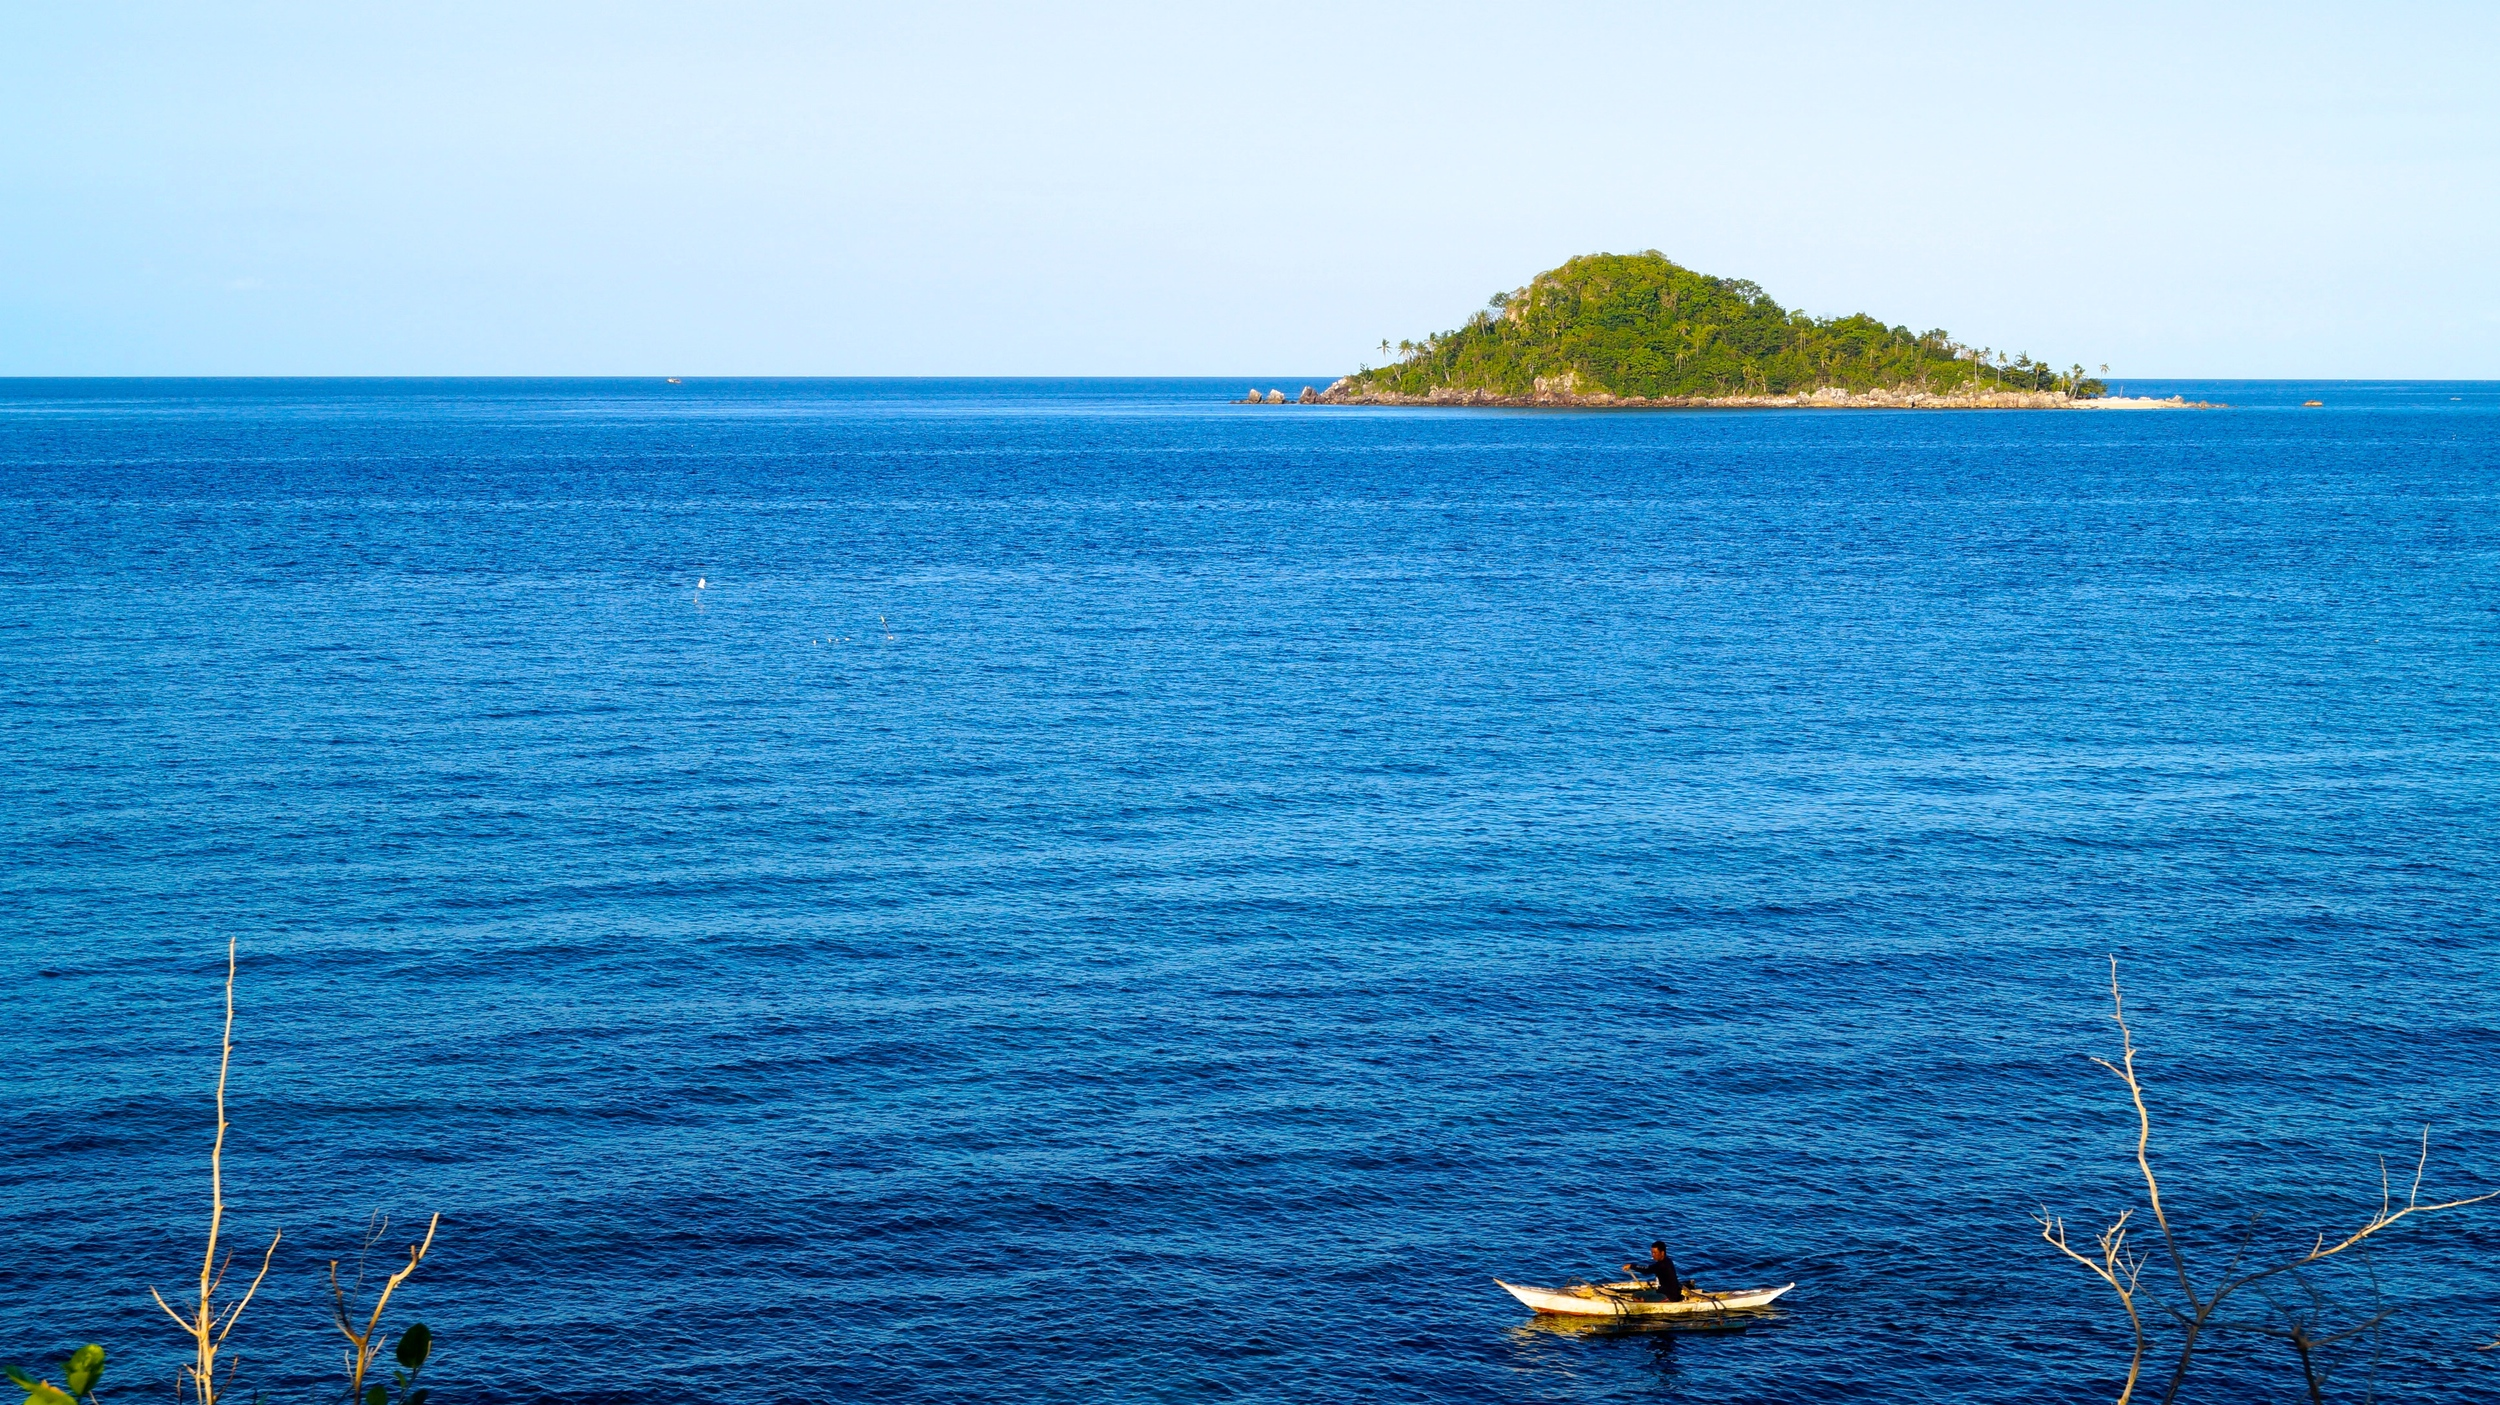 "Islas de Gigantes,维萨扬海,Bangka Fisherman - illumelatbeplay3体育官方下载ion.com"">                </noscript>                <img class="